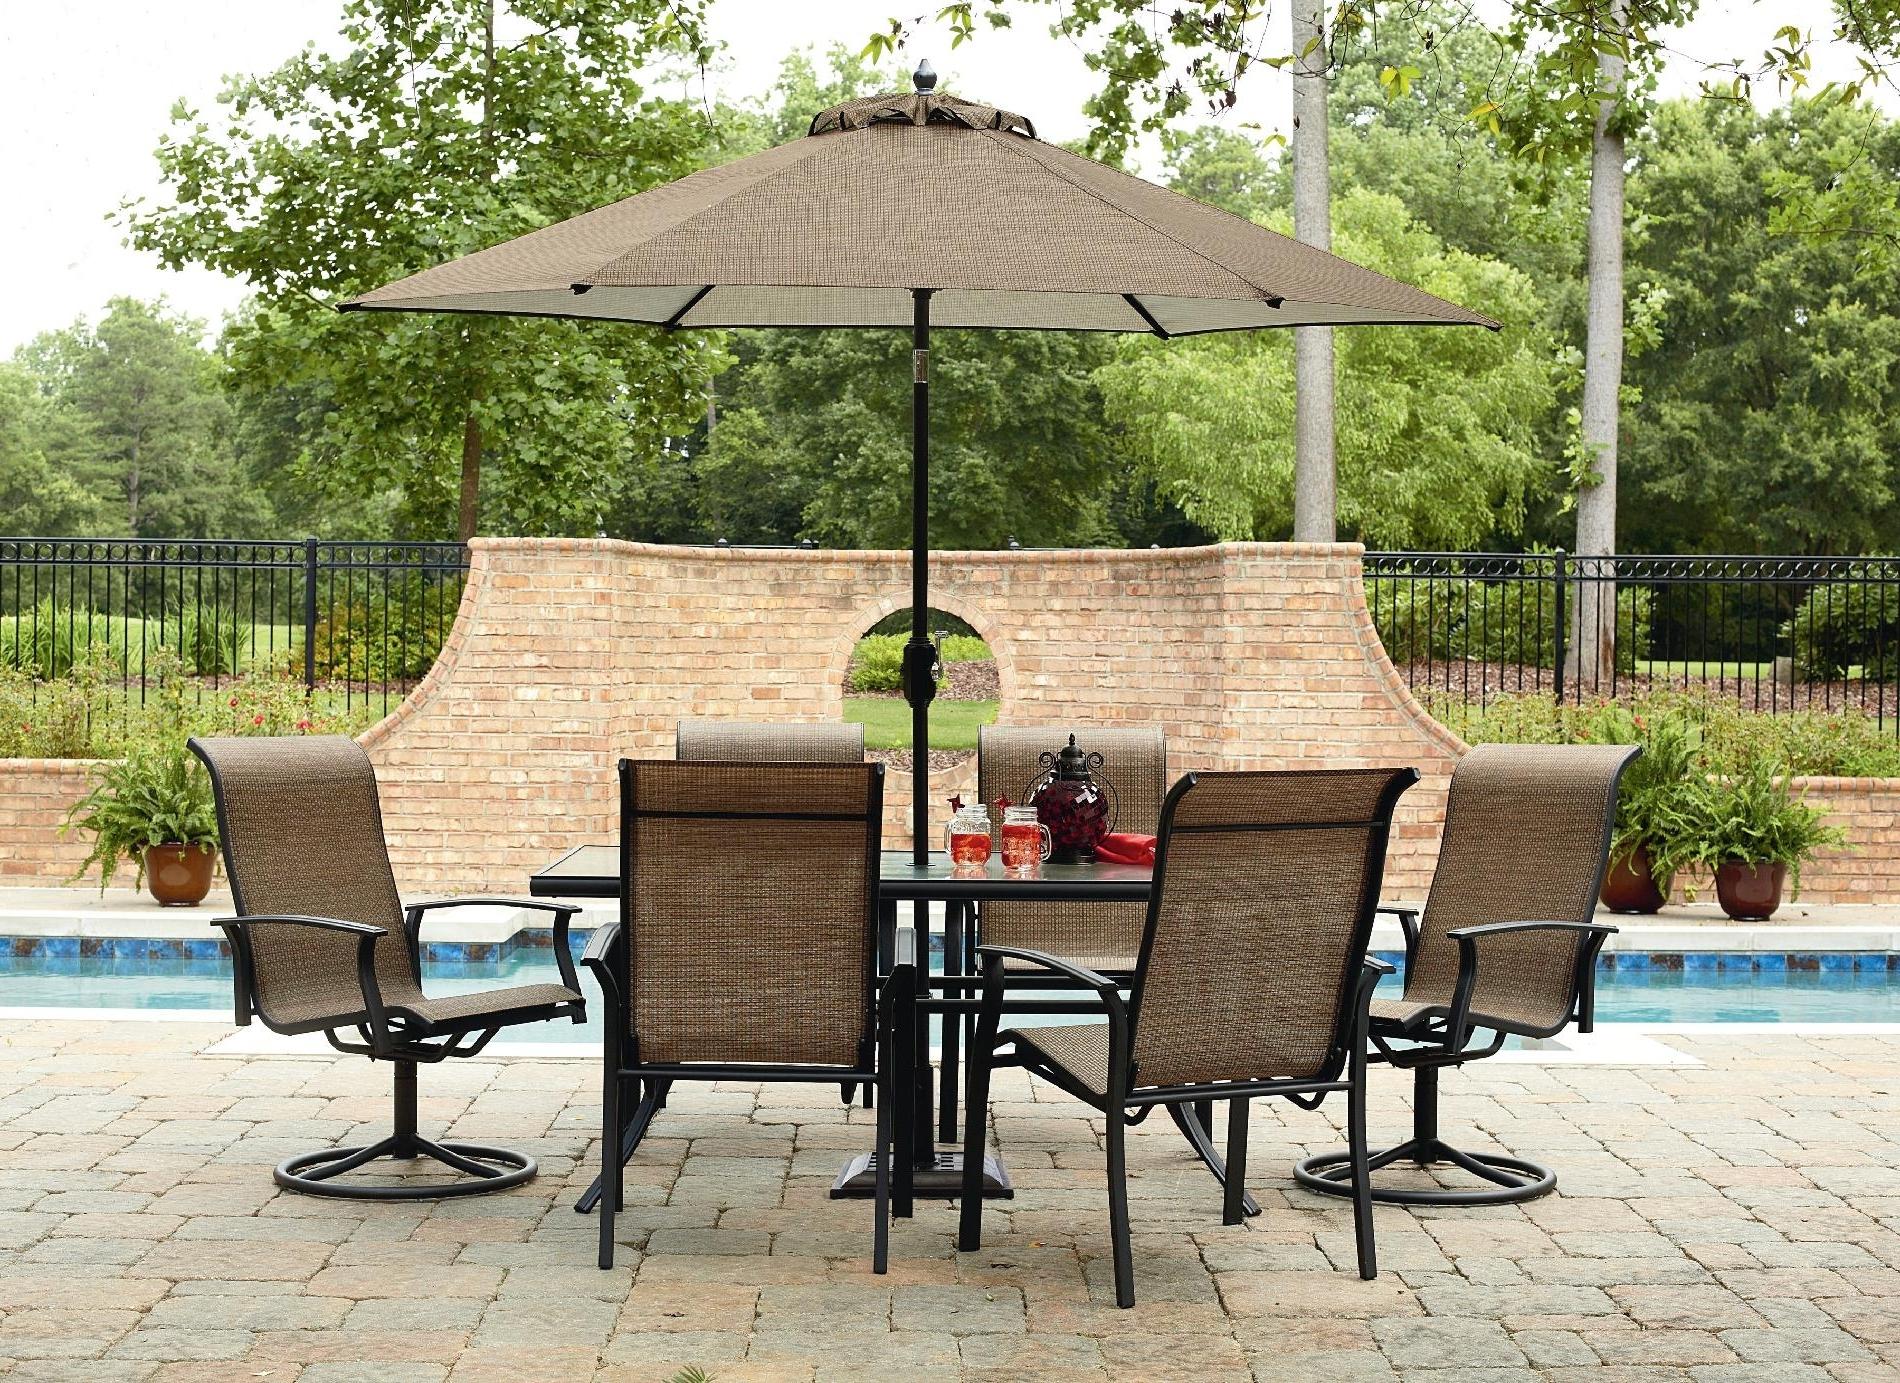 Sears Patio Umbrellas Intended For Favorite Furniture: Kmart Patio Umbrellas (View 20 of 20)